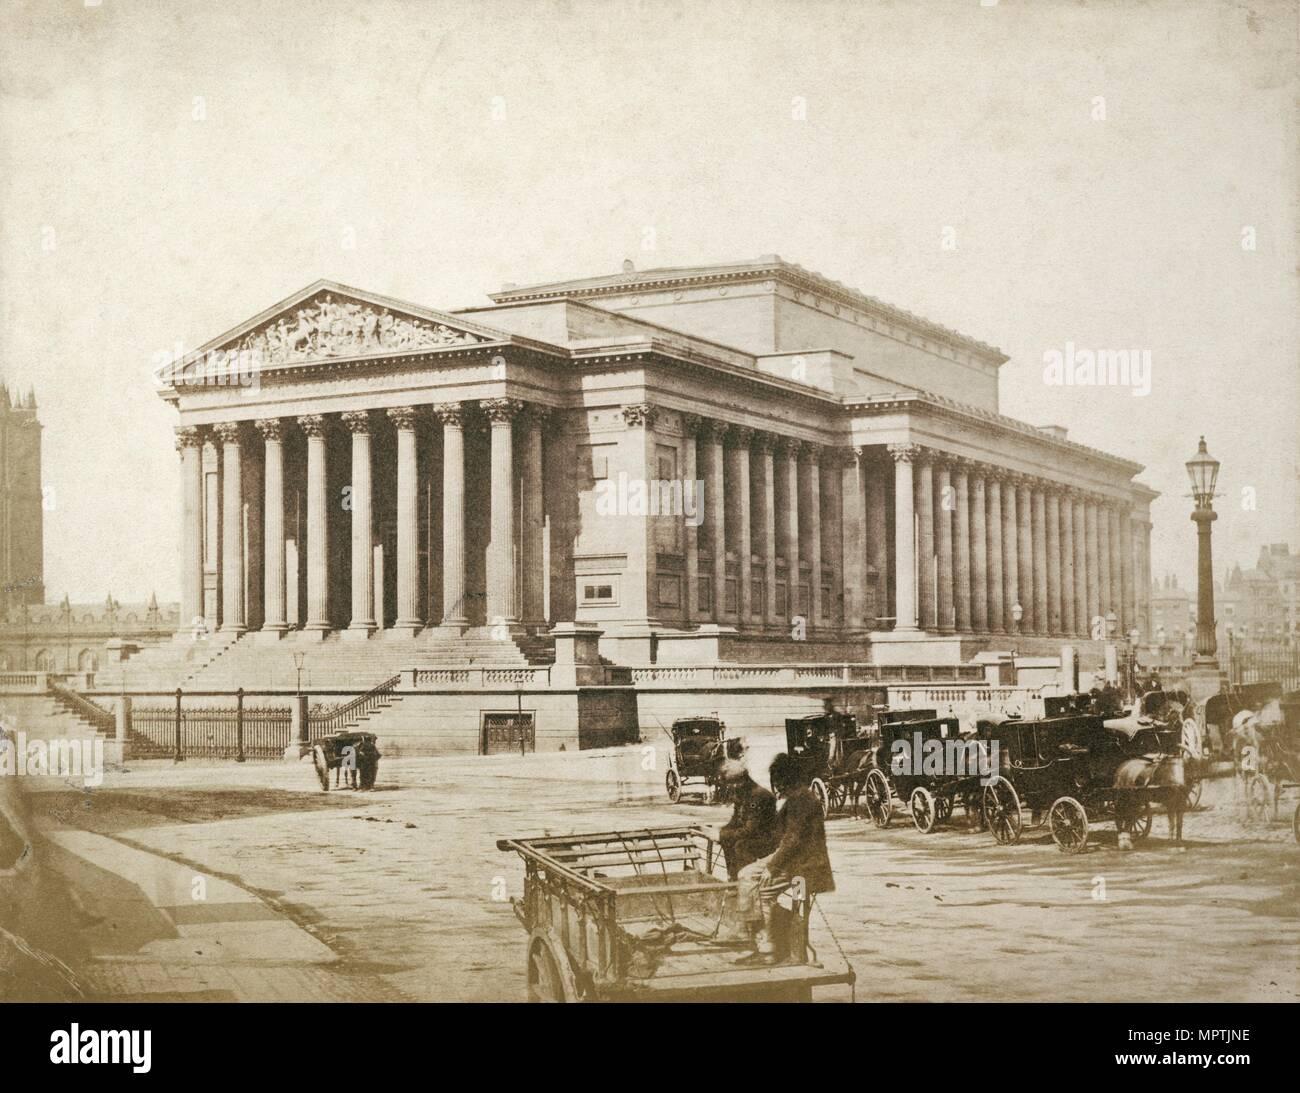 St George's Hall, St George's Plateau, Liverpool, 1854-1855. Artist: Thomas Sutton. - Stock Image